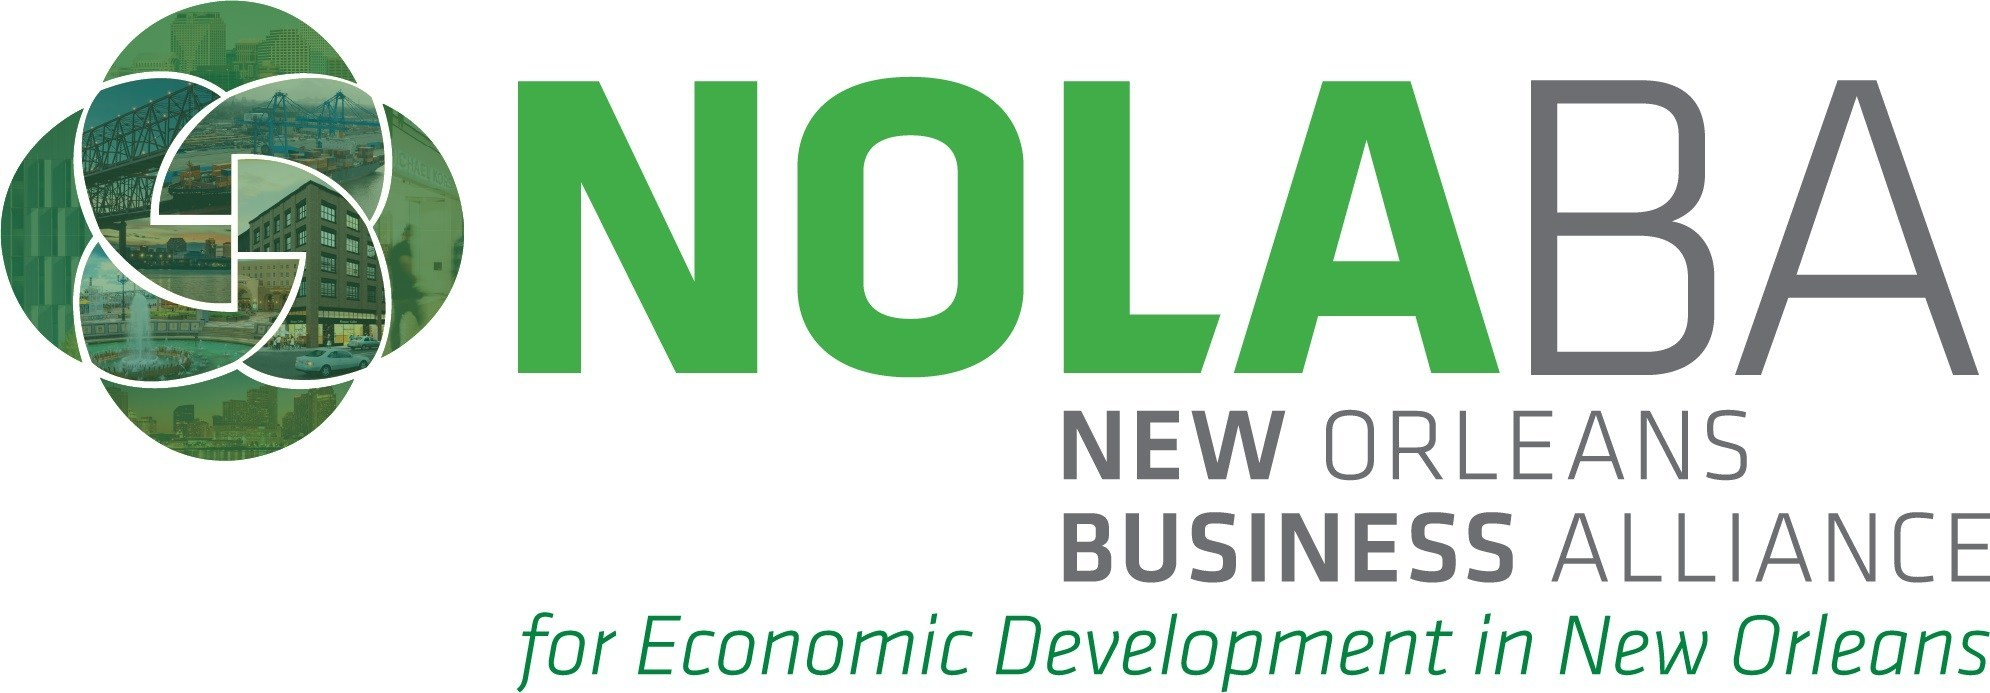 New Orleans Business Alliance (PRNewsfoto/New Orleans Business Alliance)